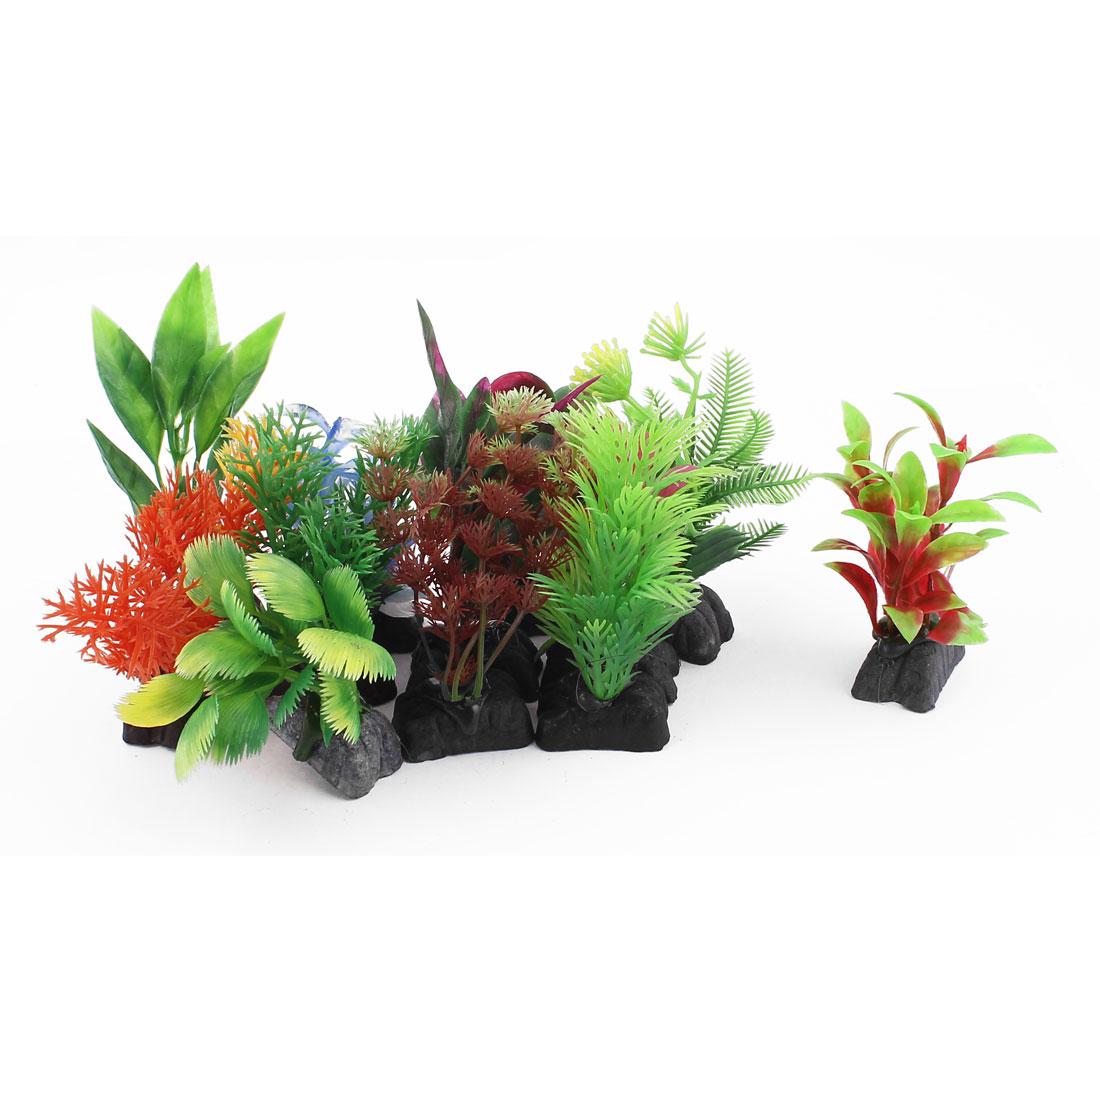 12pcs Assorted Color Plastic Ceramic Base Aquarium Plant Grass Decor for Fishbowl Fish Tank